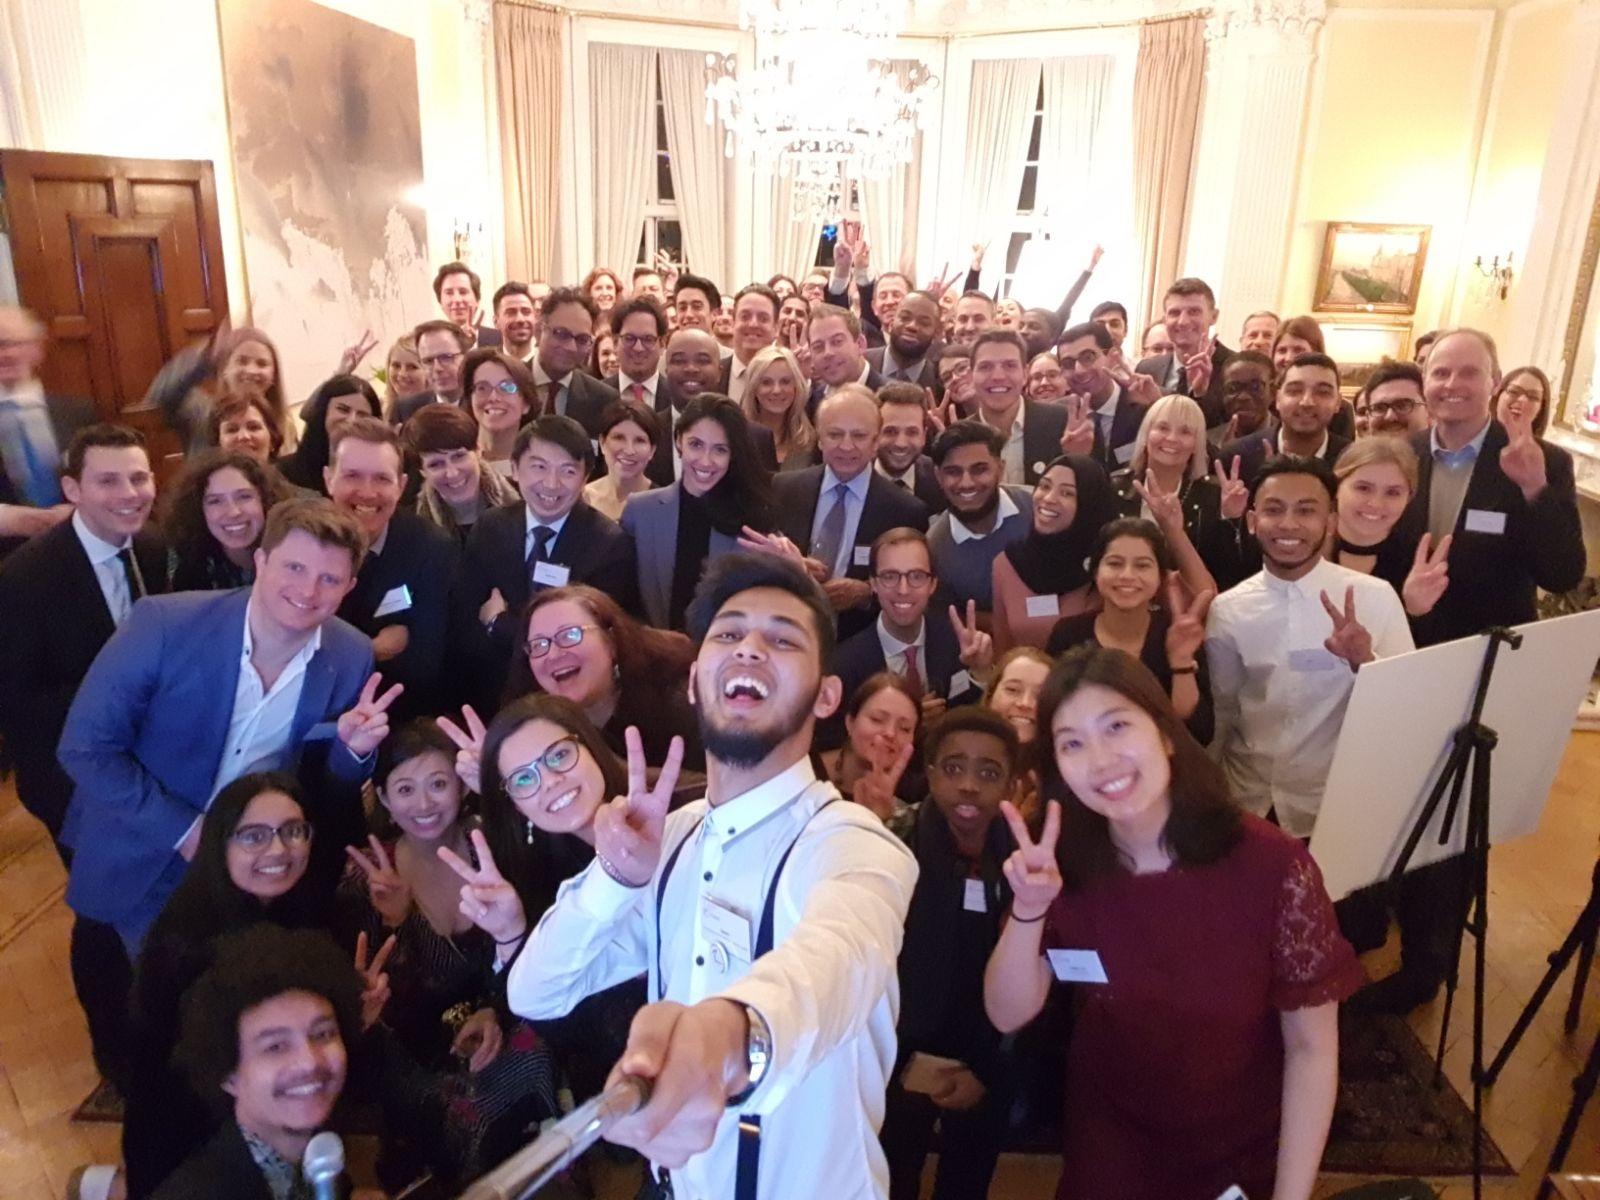 Norwegian Ambassador's Residence Reception